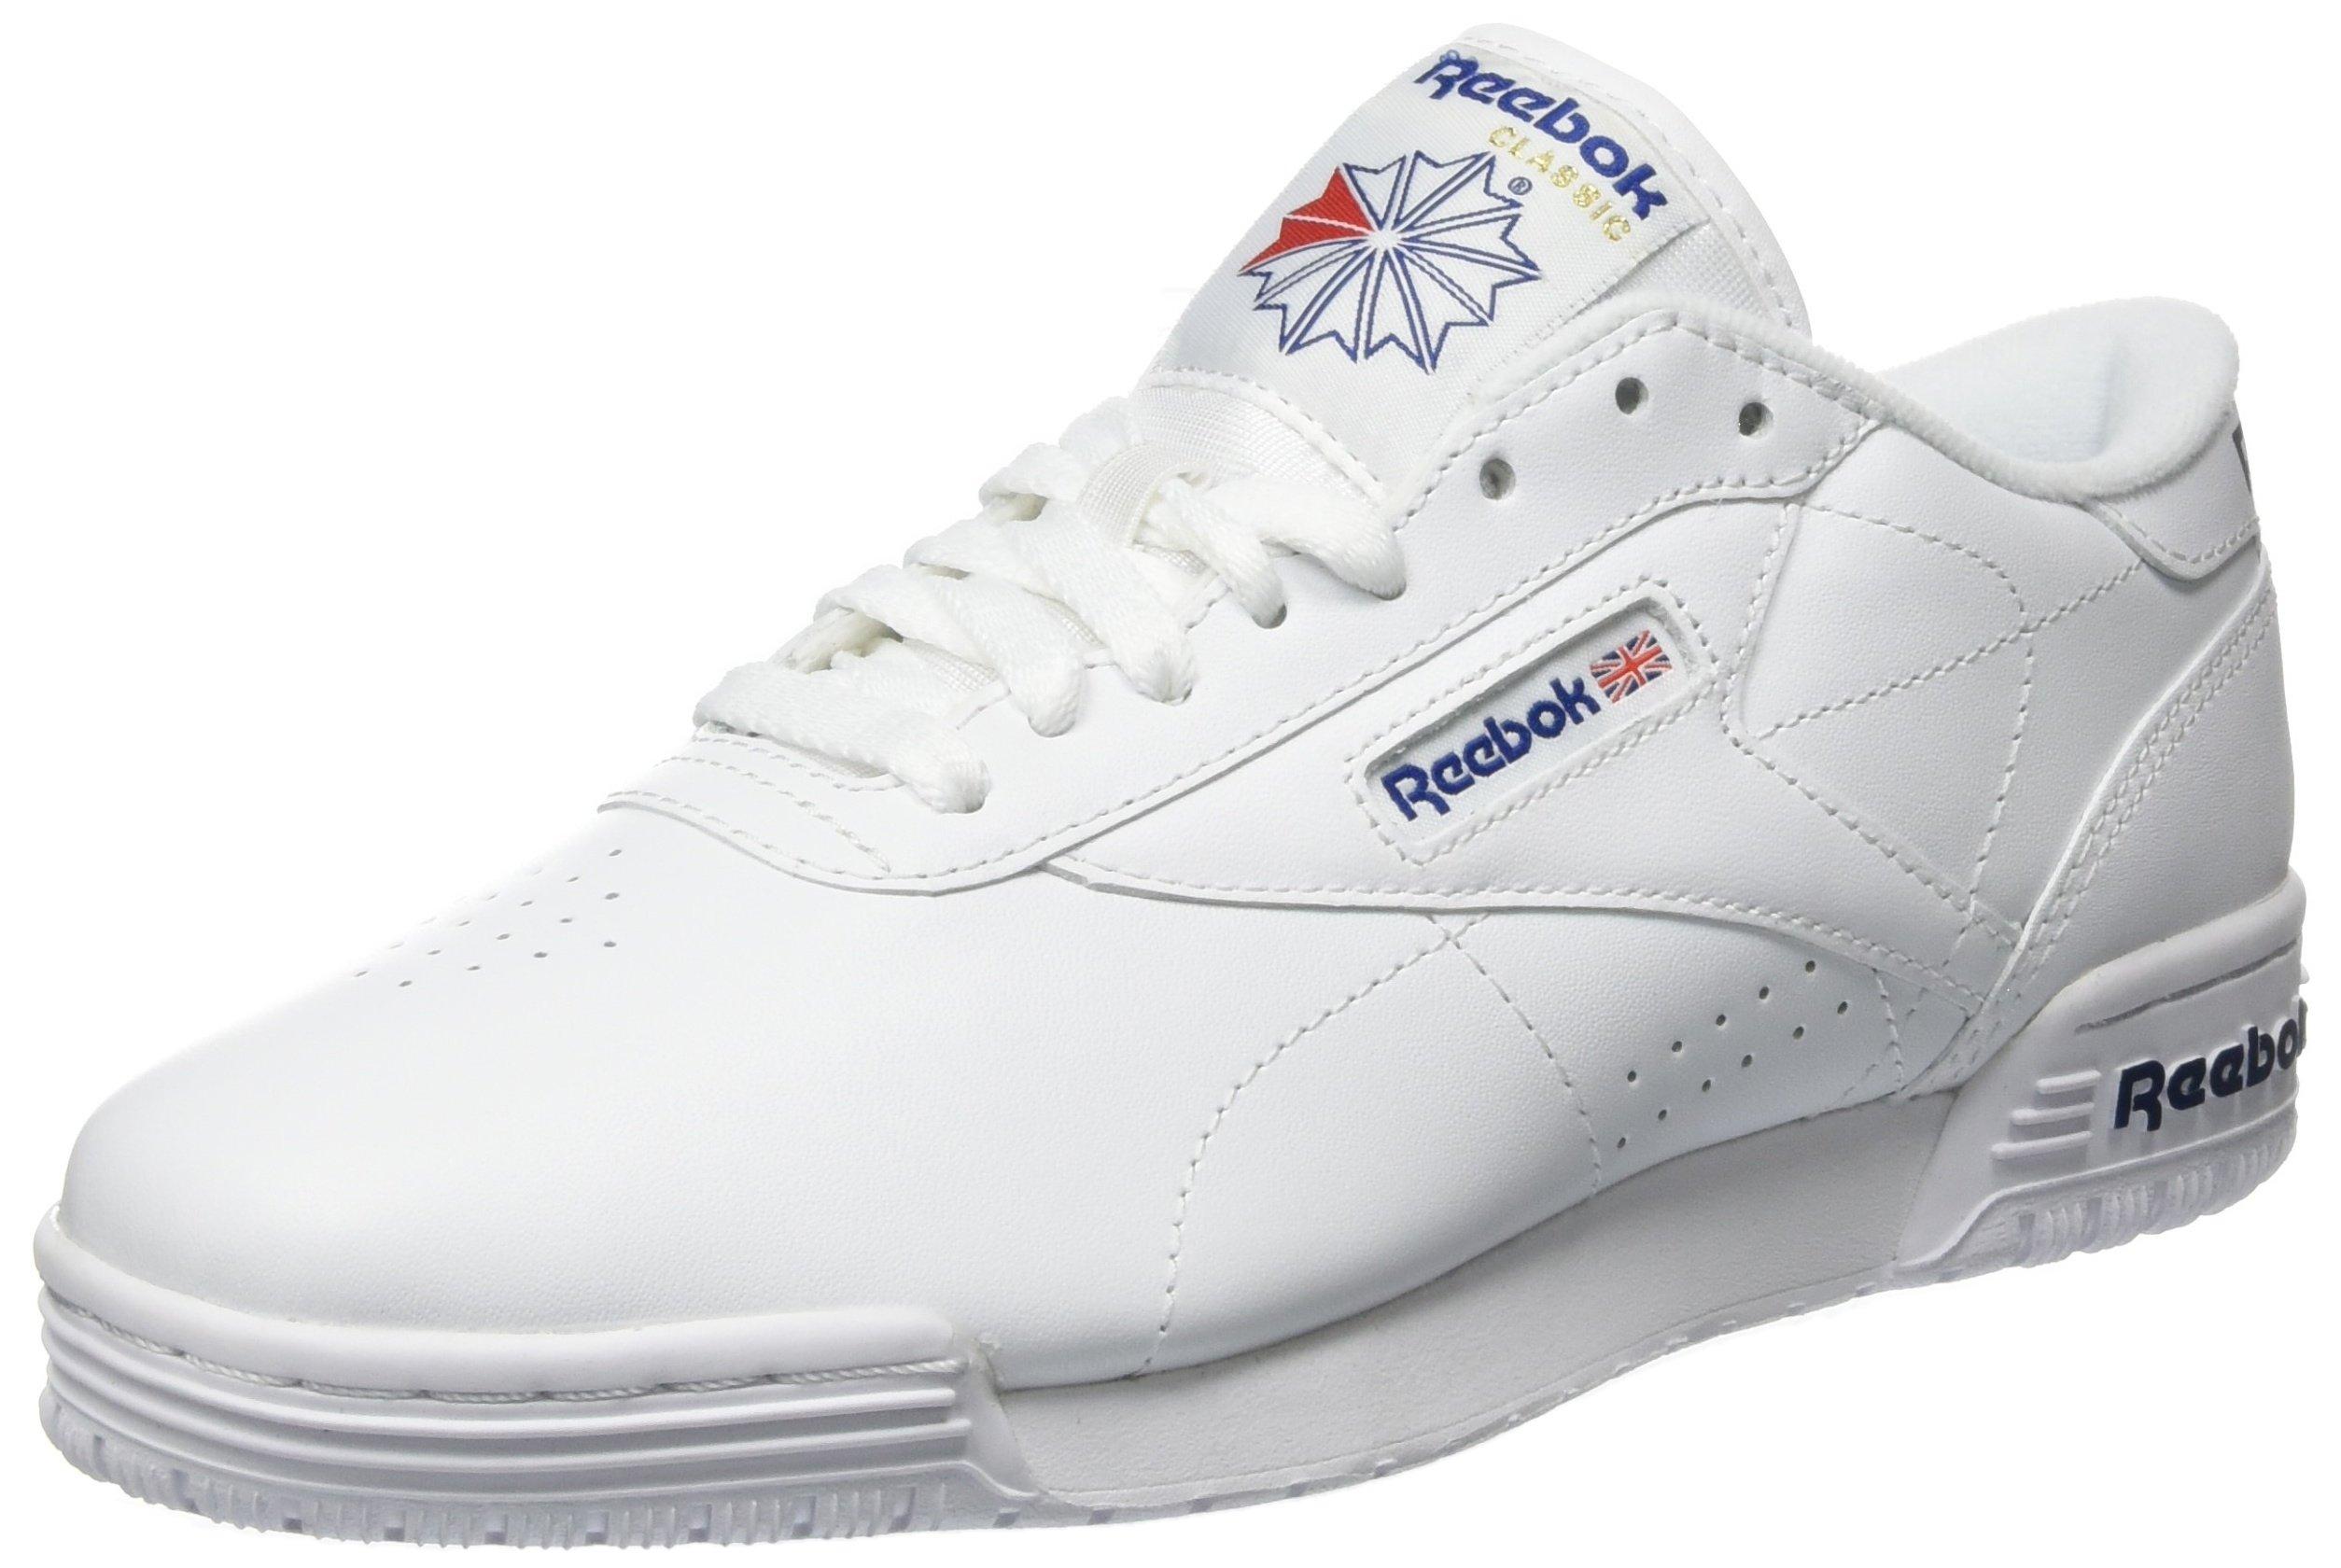 5 Reebok 00036 Lo Clean Blue GarçonBlancint Exofit LogoChaussures white Royal Fitness De Eu fIb7yvgY6m